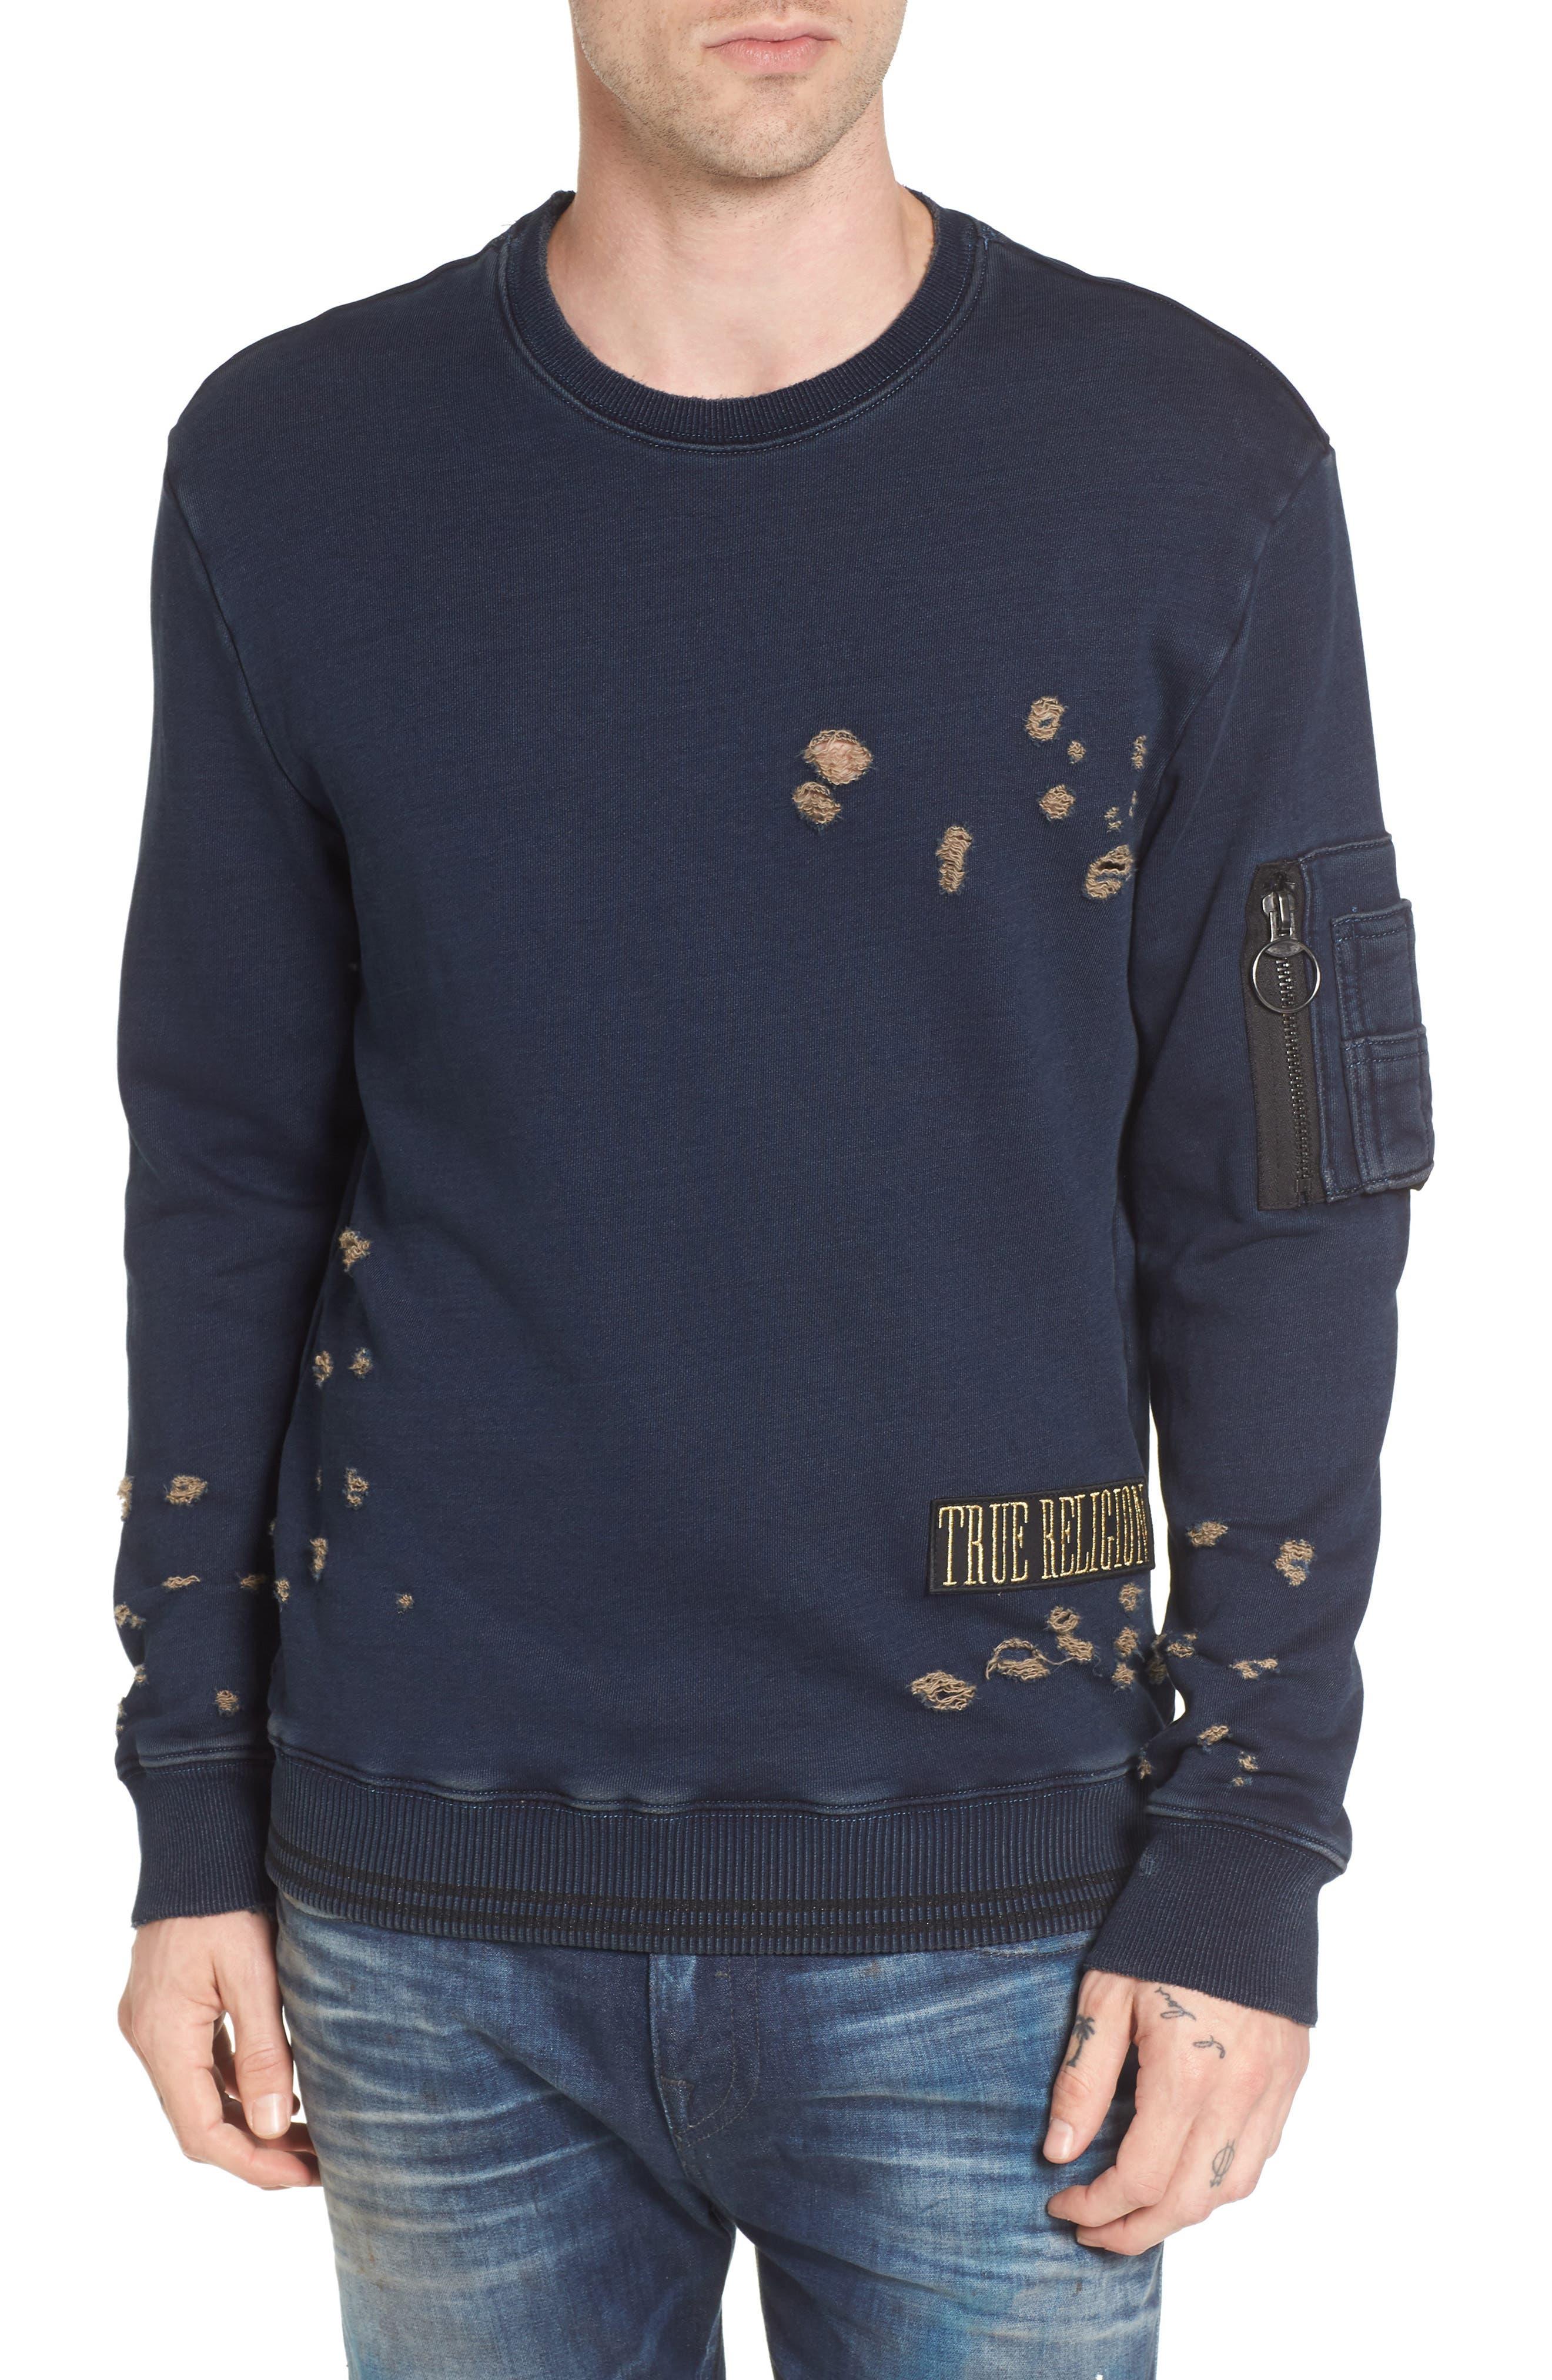 True Religion Brand Jeans Distressed Sweatshirt